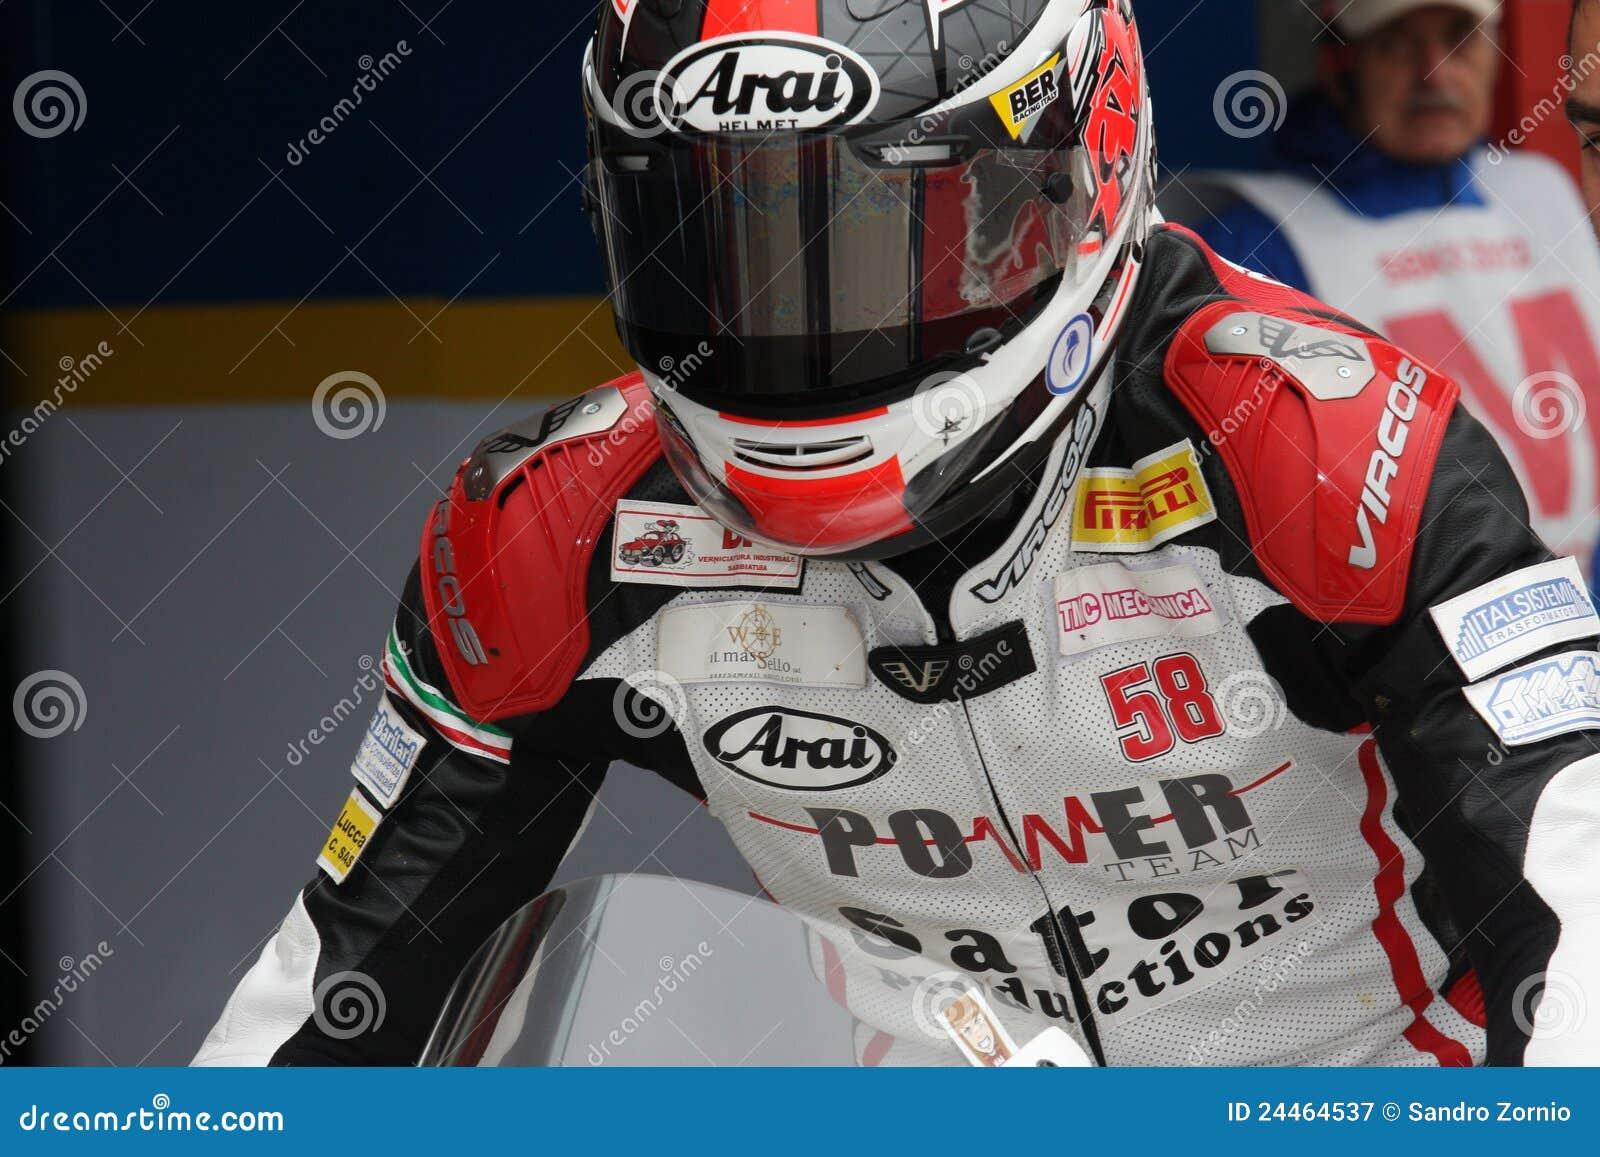 Alex Baldolini Triumph Daytona 675 Power Suriano